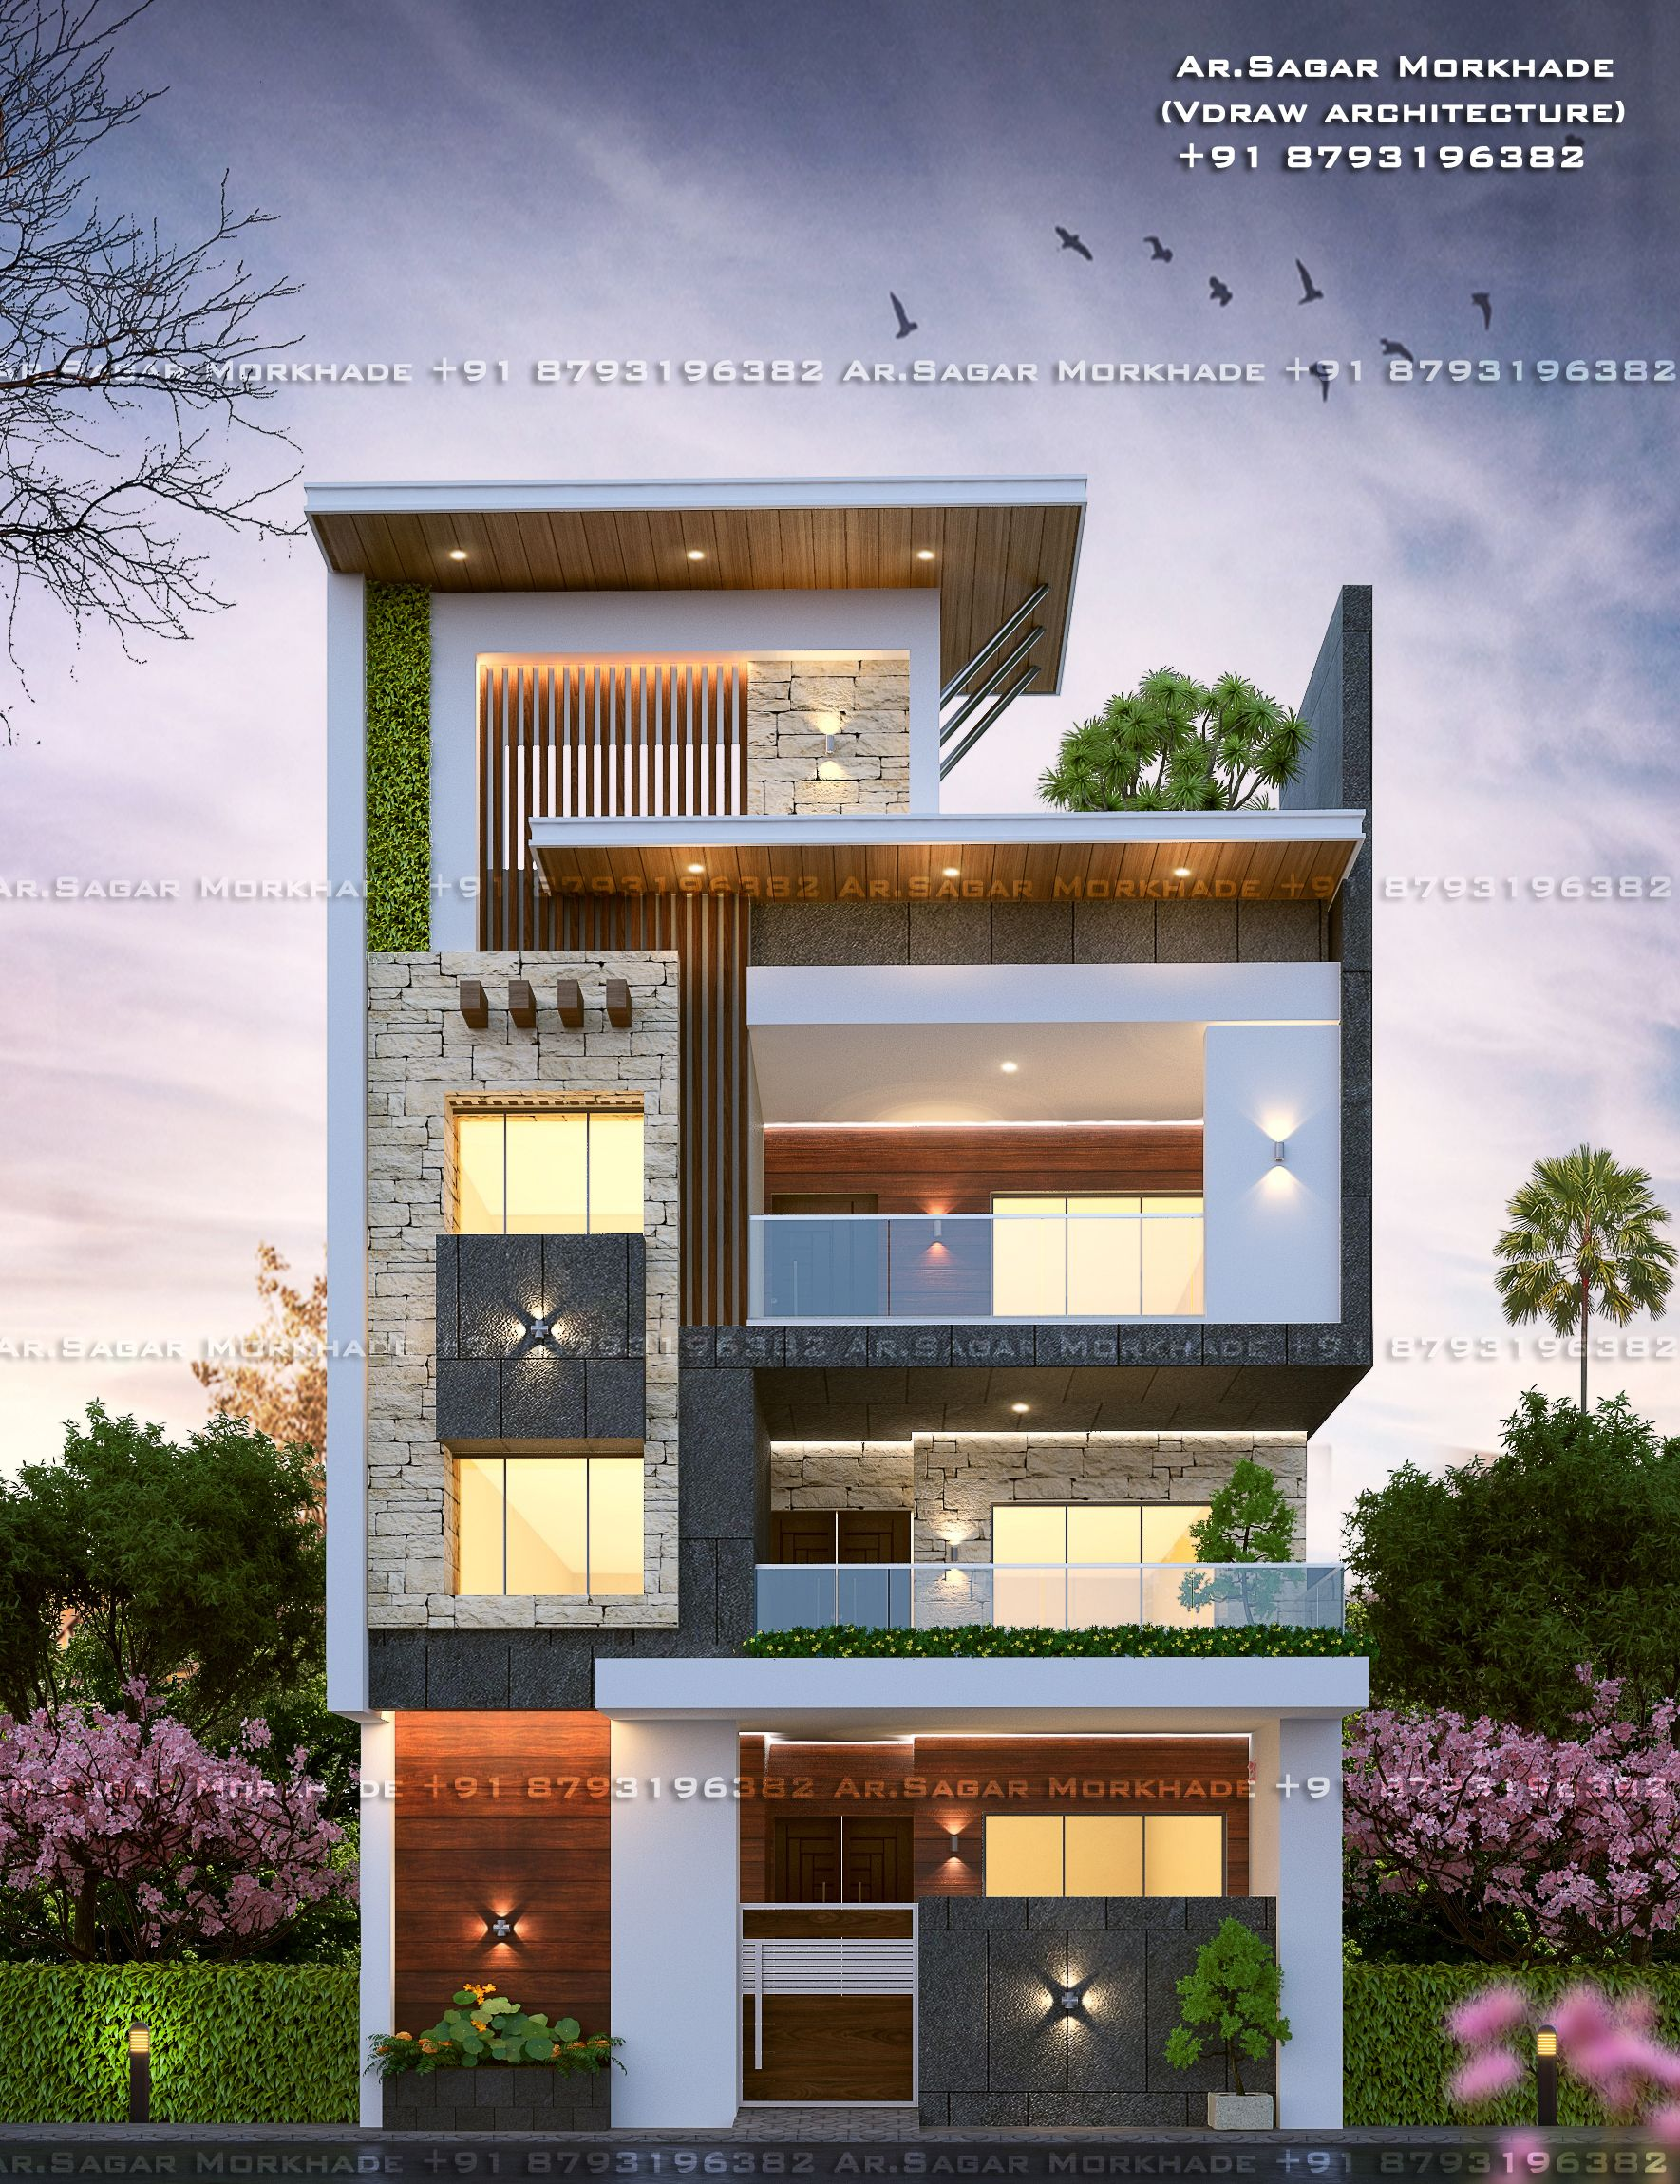 Modern House Bungalow Exterior By Ar Sagar Morkhade Vdraw Architecture 91 8793196382: #Contemporary#Modern #Residential #House #bungalow#Modern Architecture #Exterior B…